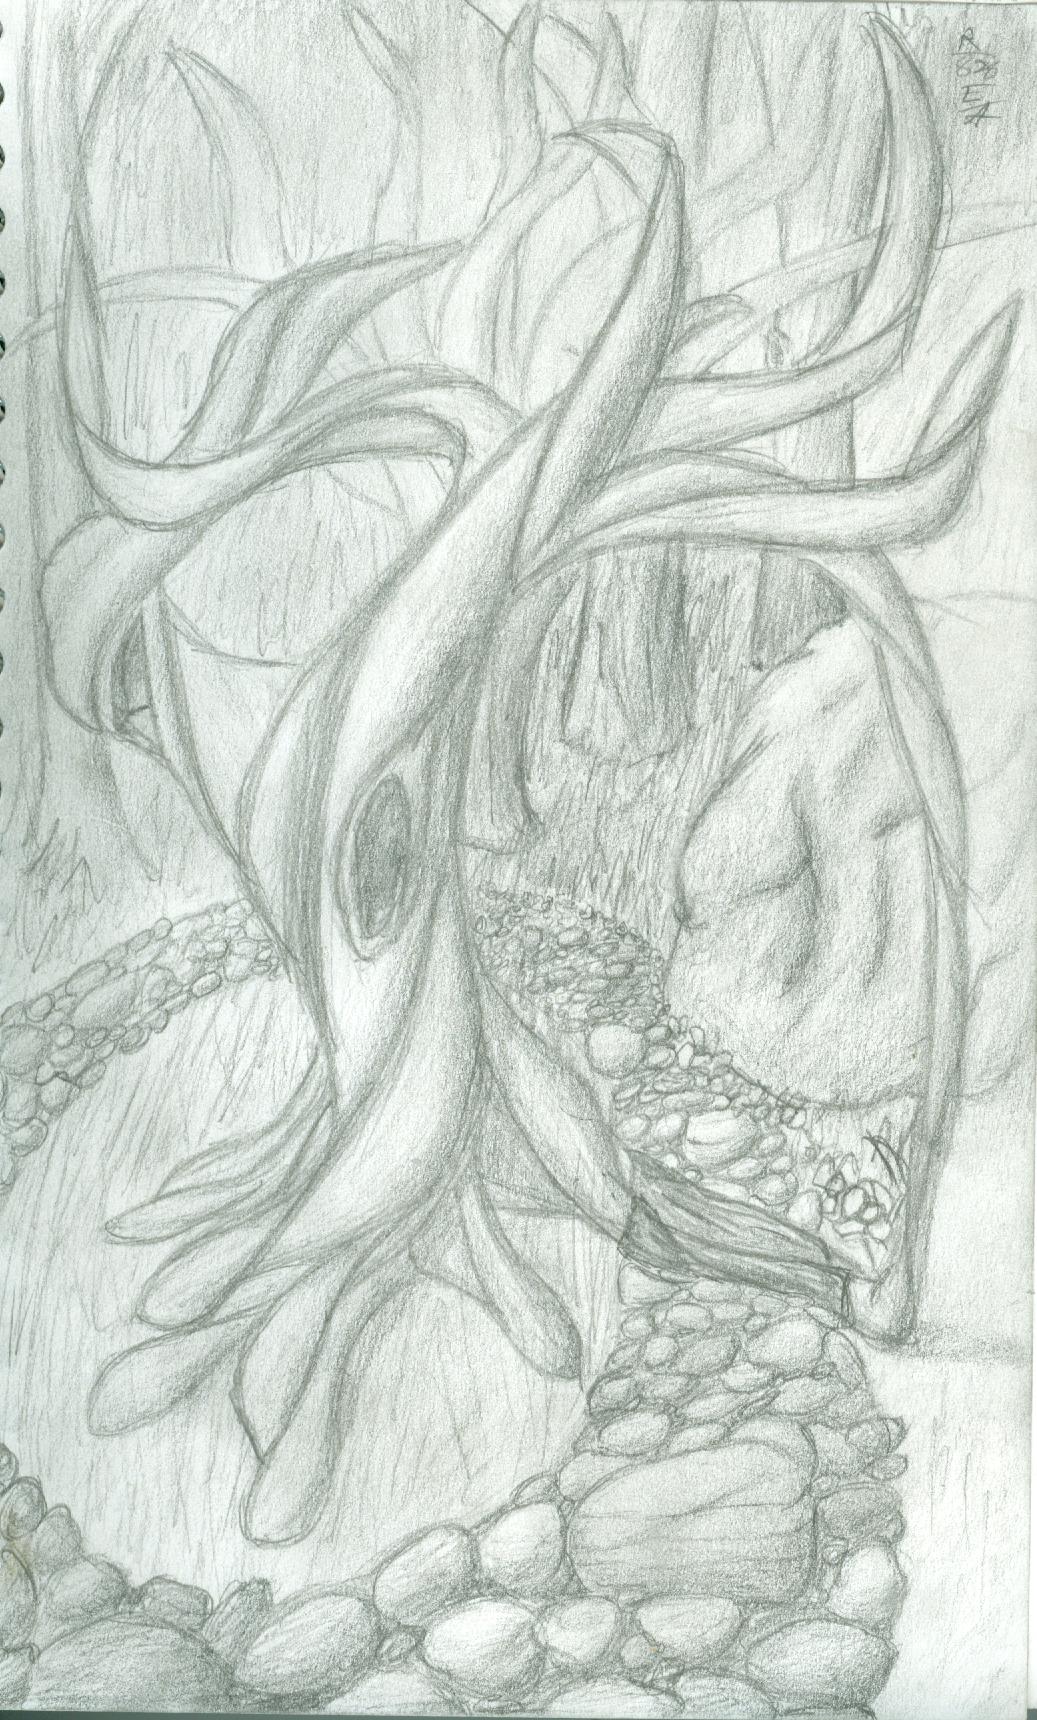 Magical tree by XxRoset-828xX